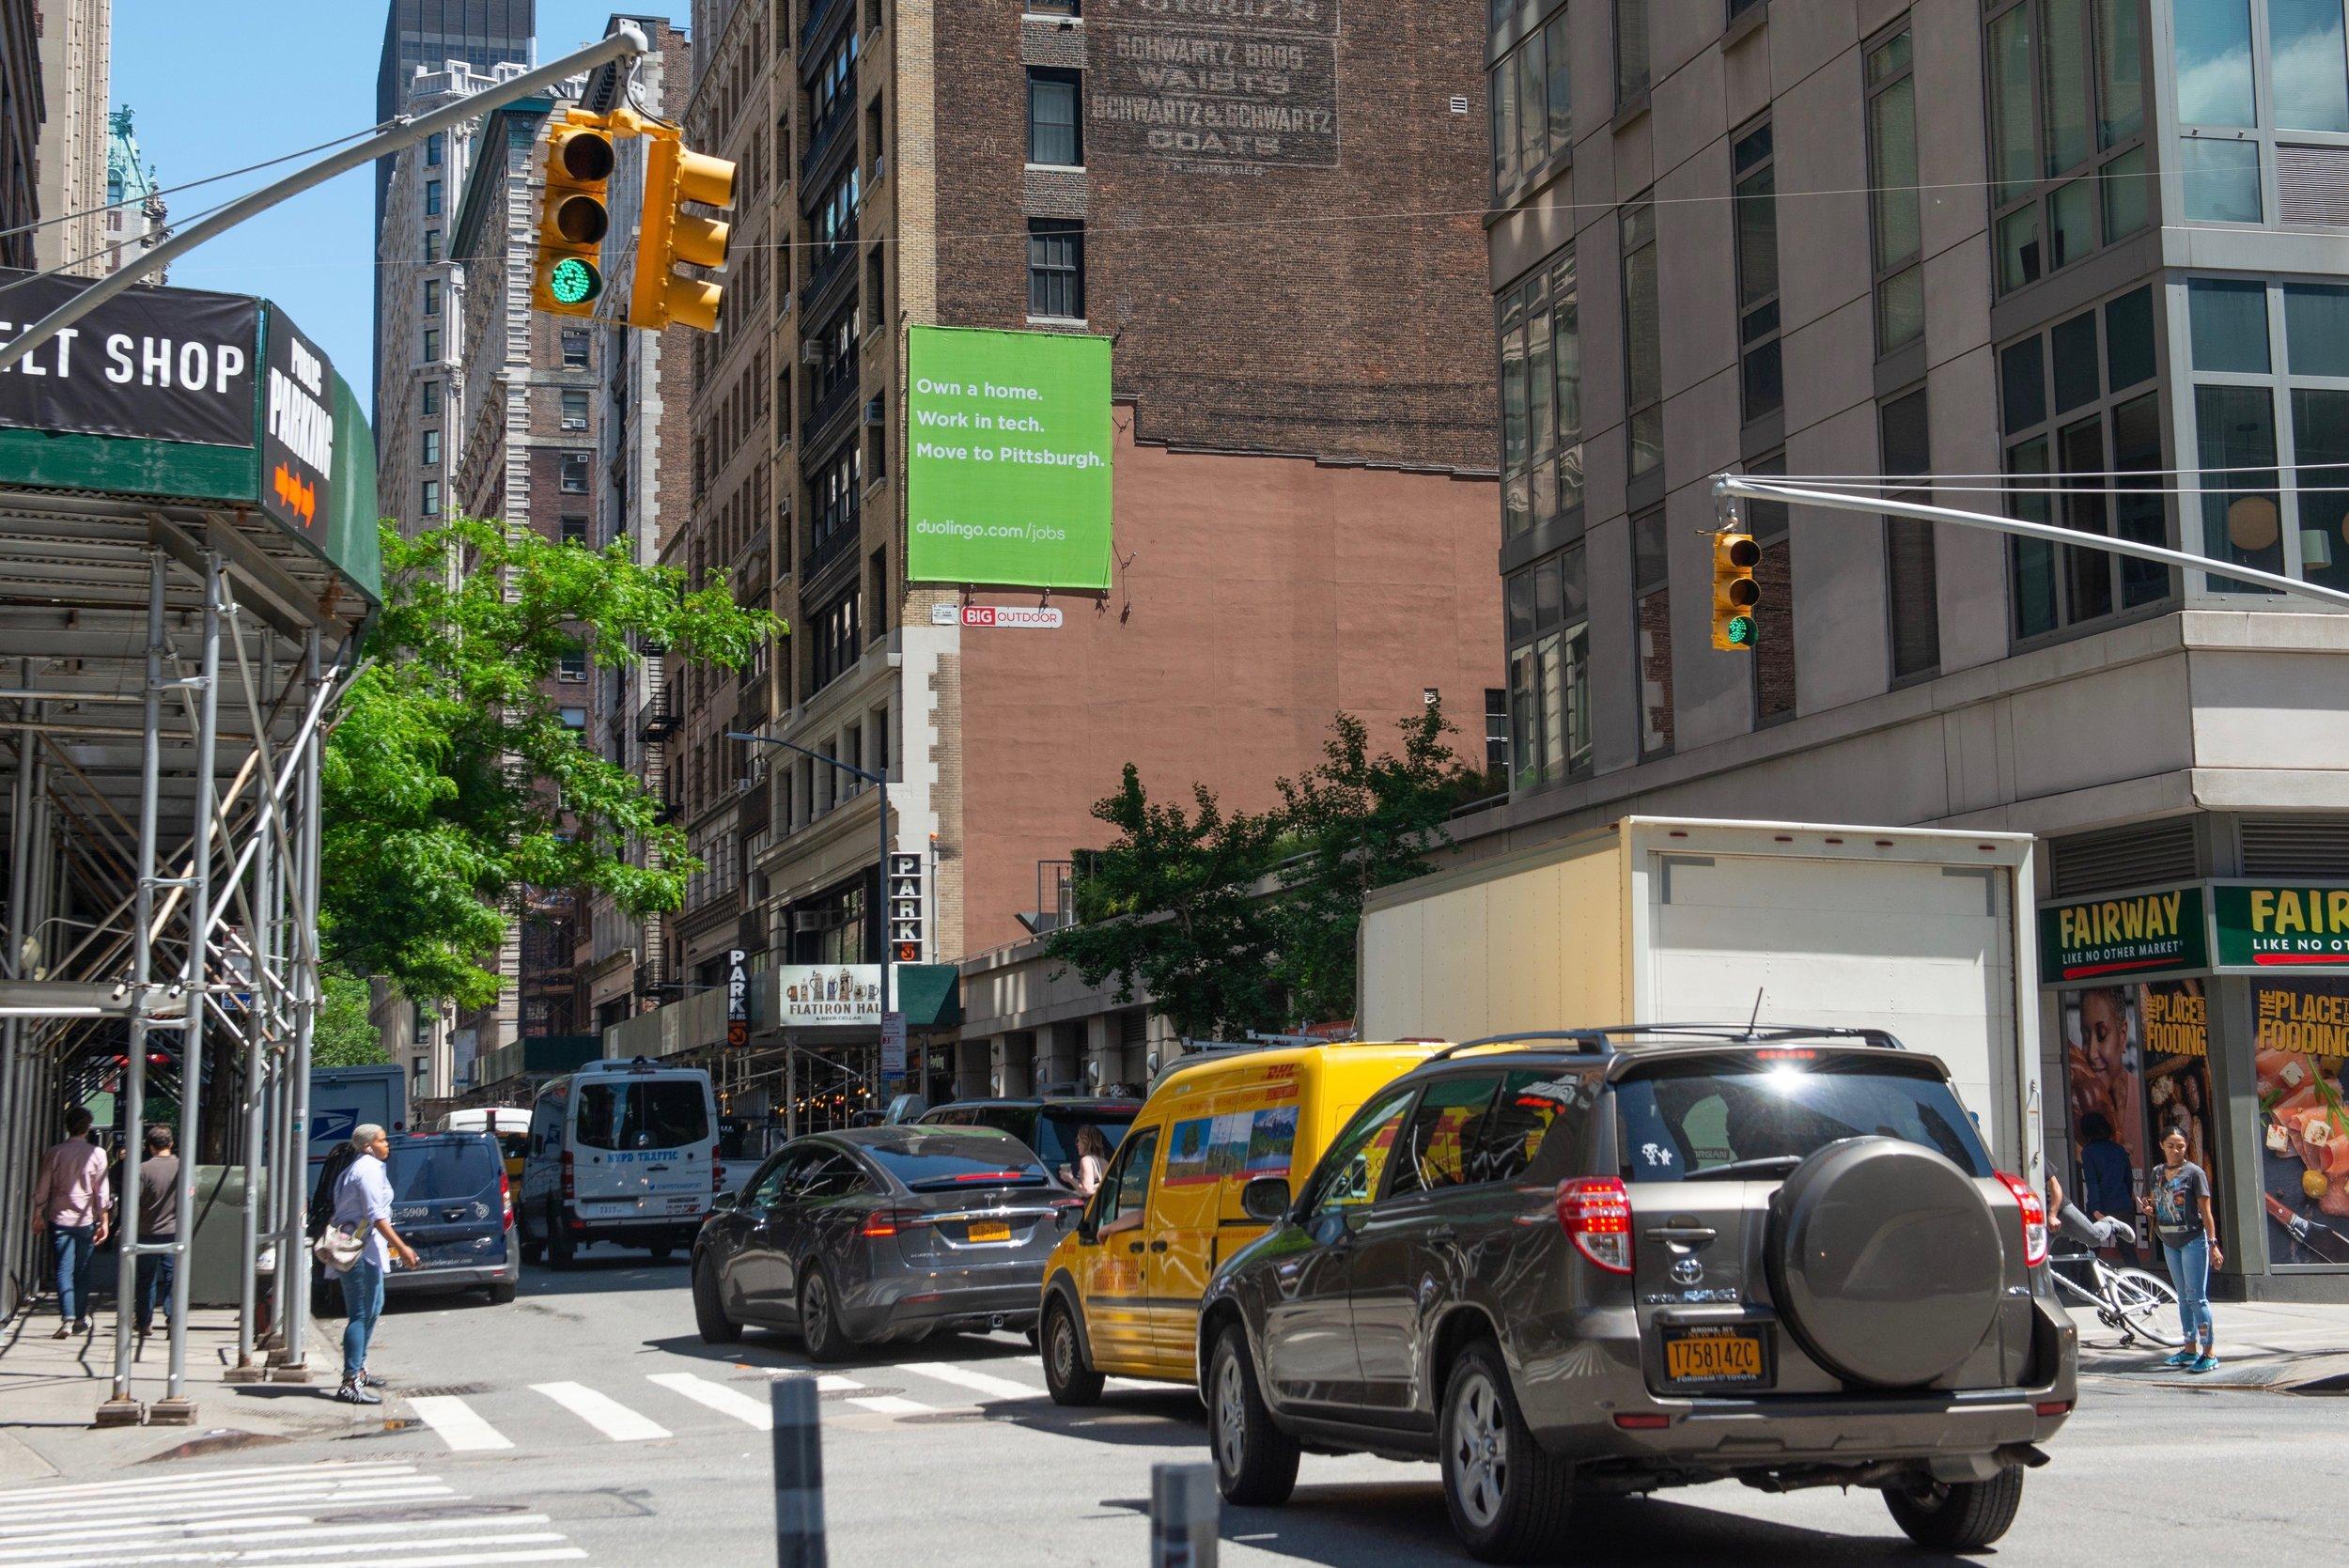 NY.W106_DUOLINGO_APPROACH3_052318.jpg